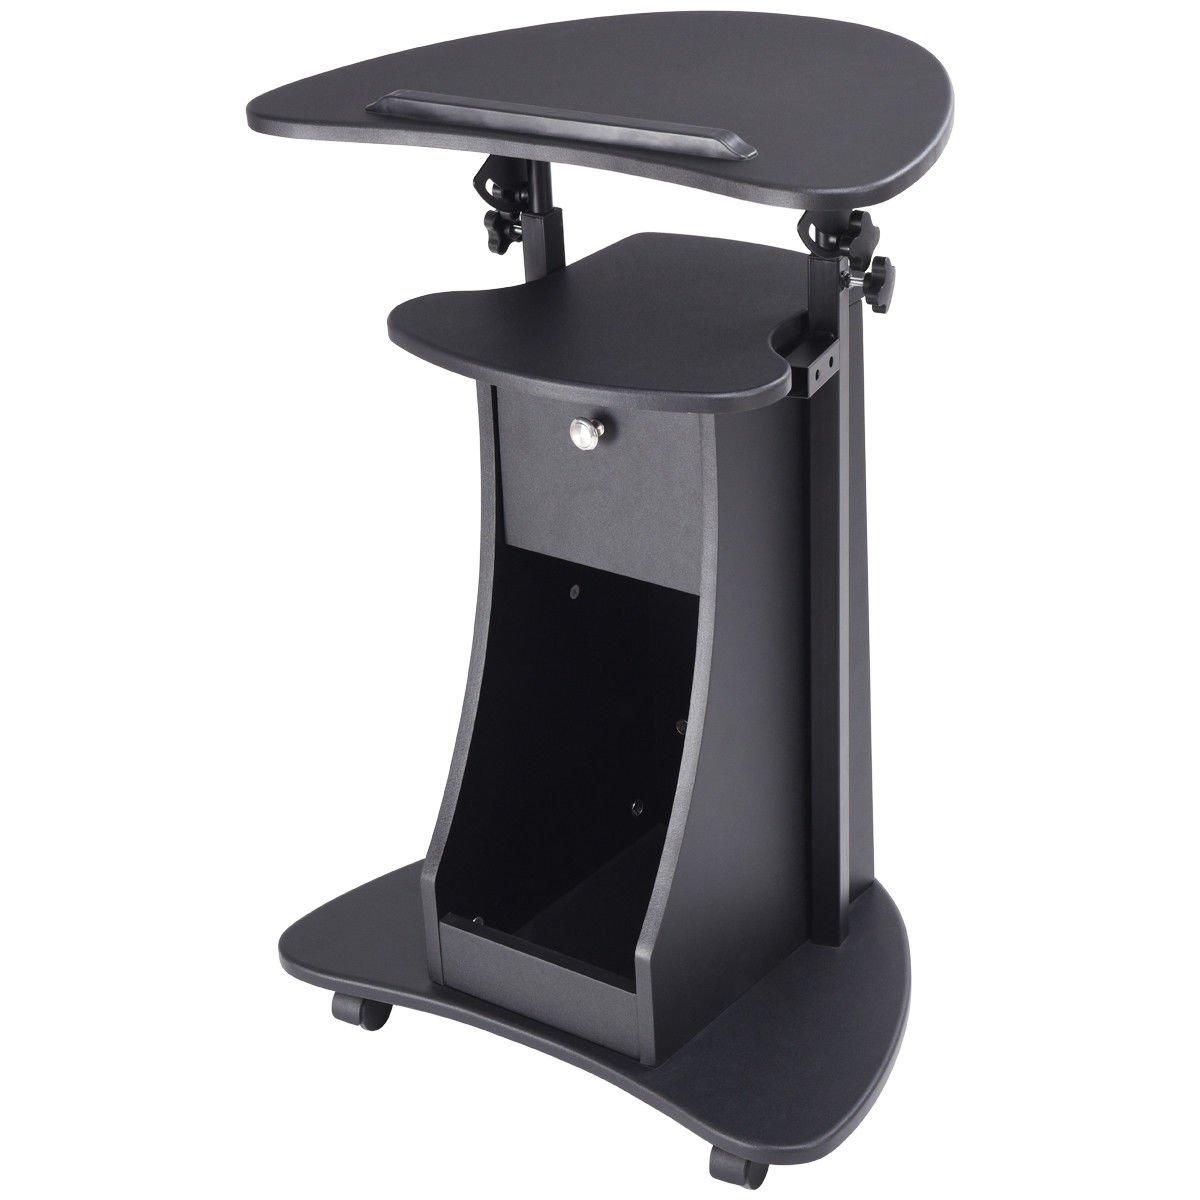 Black Rolling Laptop Cart Stand Up Desk Storage w/ Adjustable Height 32'' - 46''